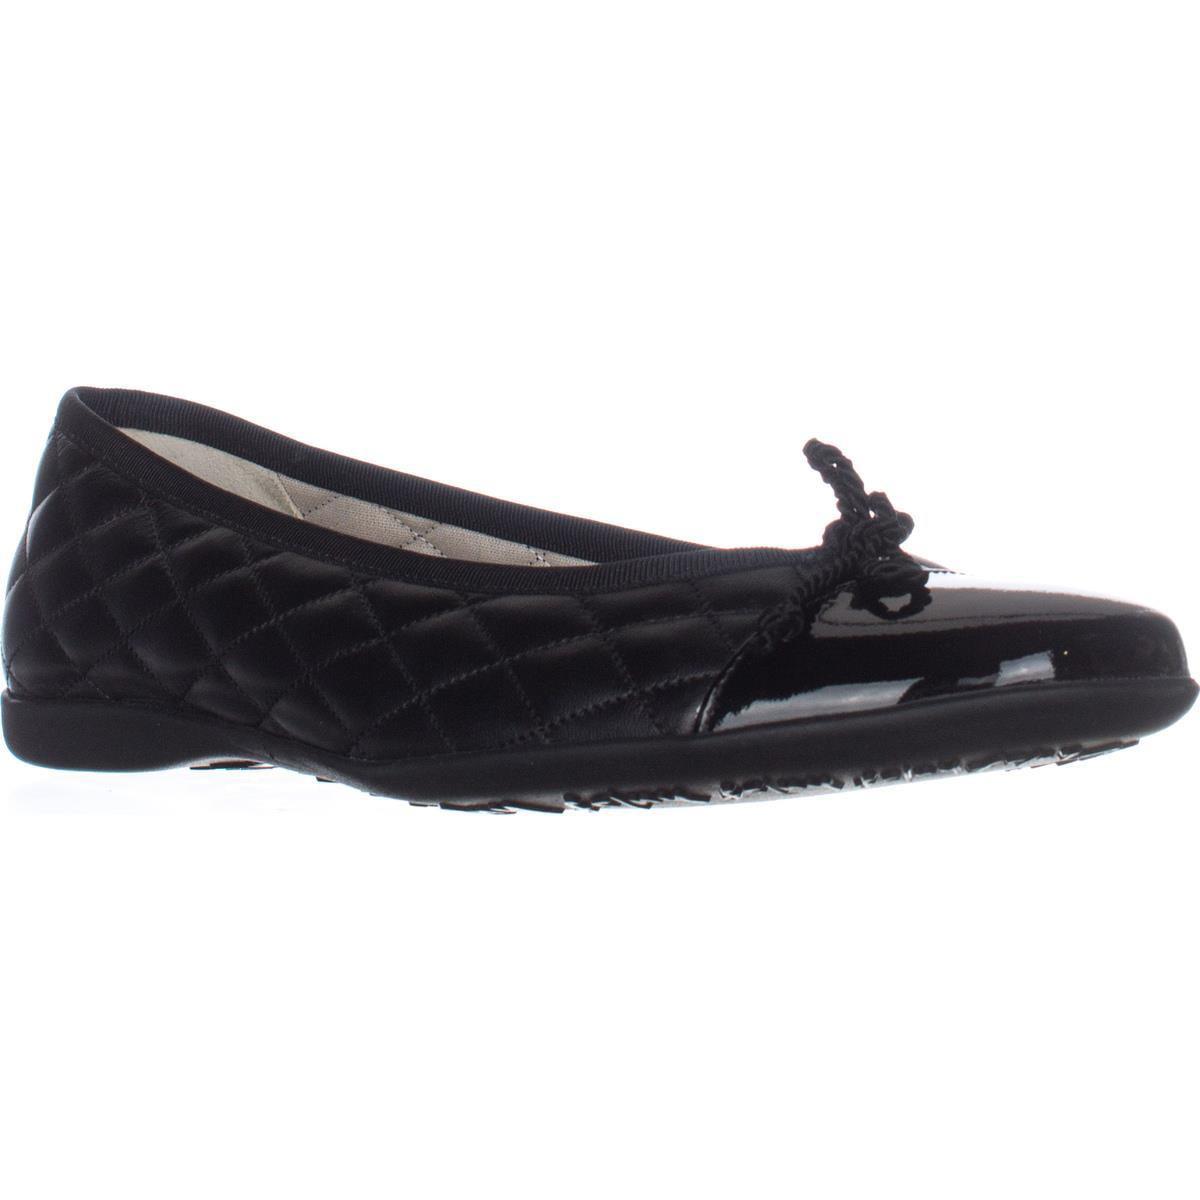 Womens French Sole FS/NY Passport Ballet Flats - Black Pa...